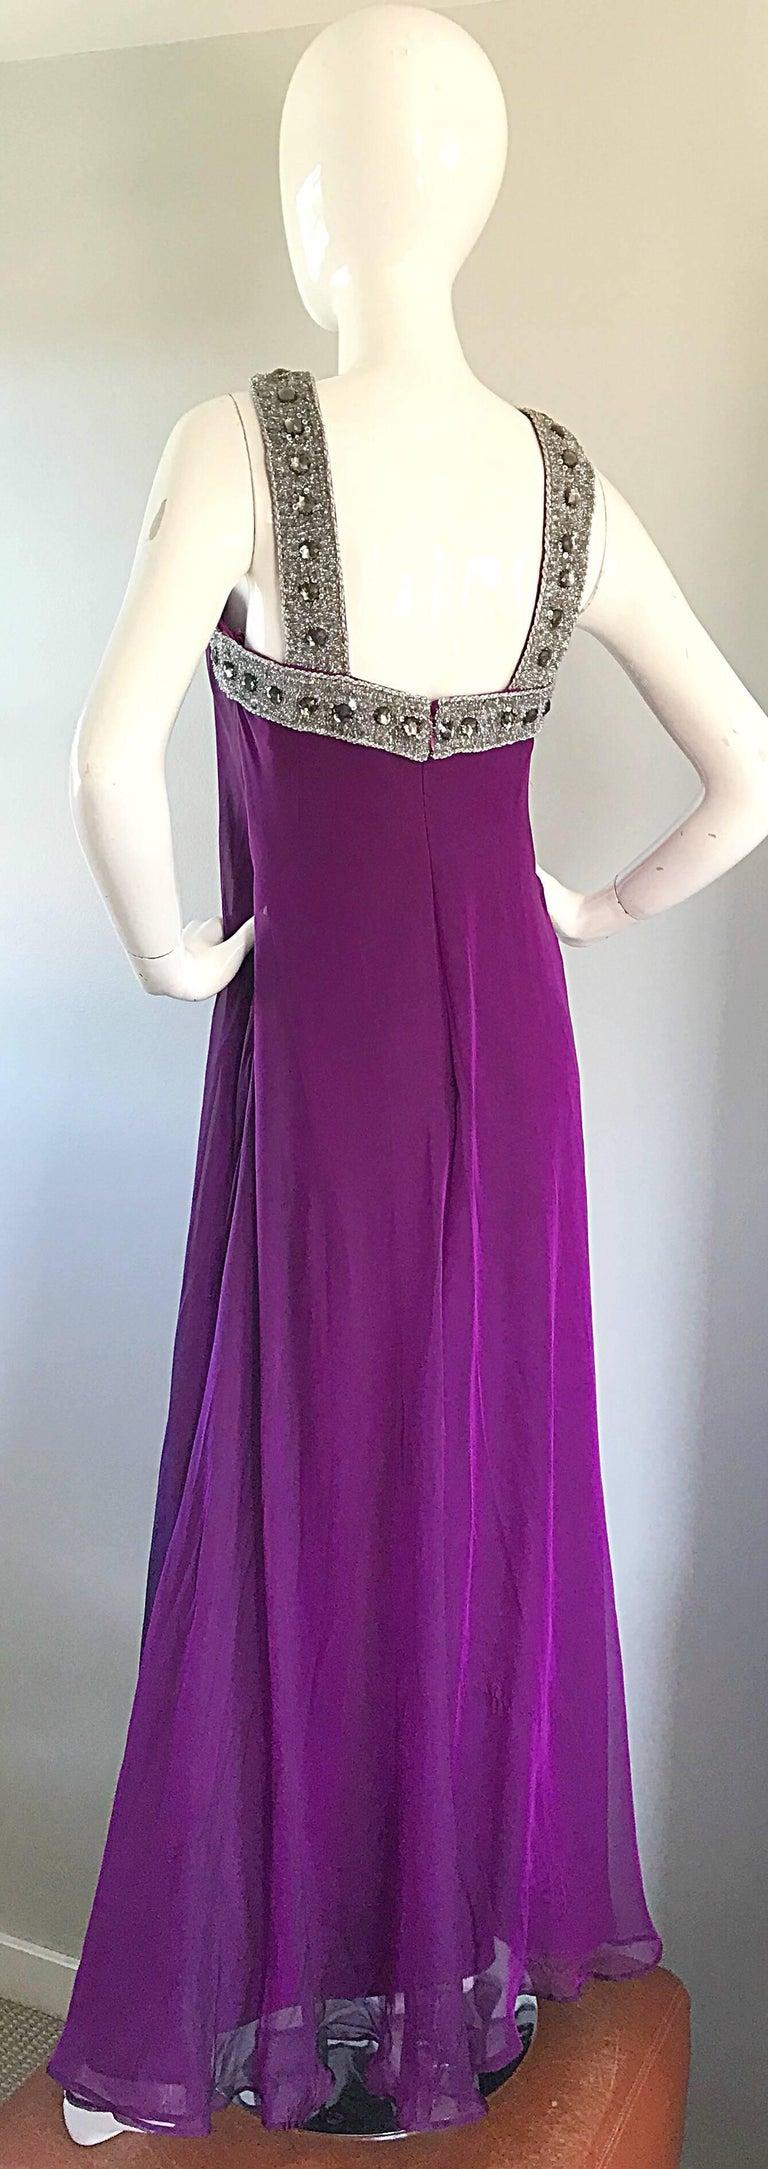 1990s Badgley Mischka Size 4 Purple Silk Chiffon Rhinestone Vintage ...